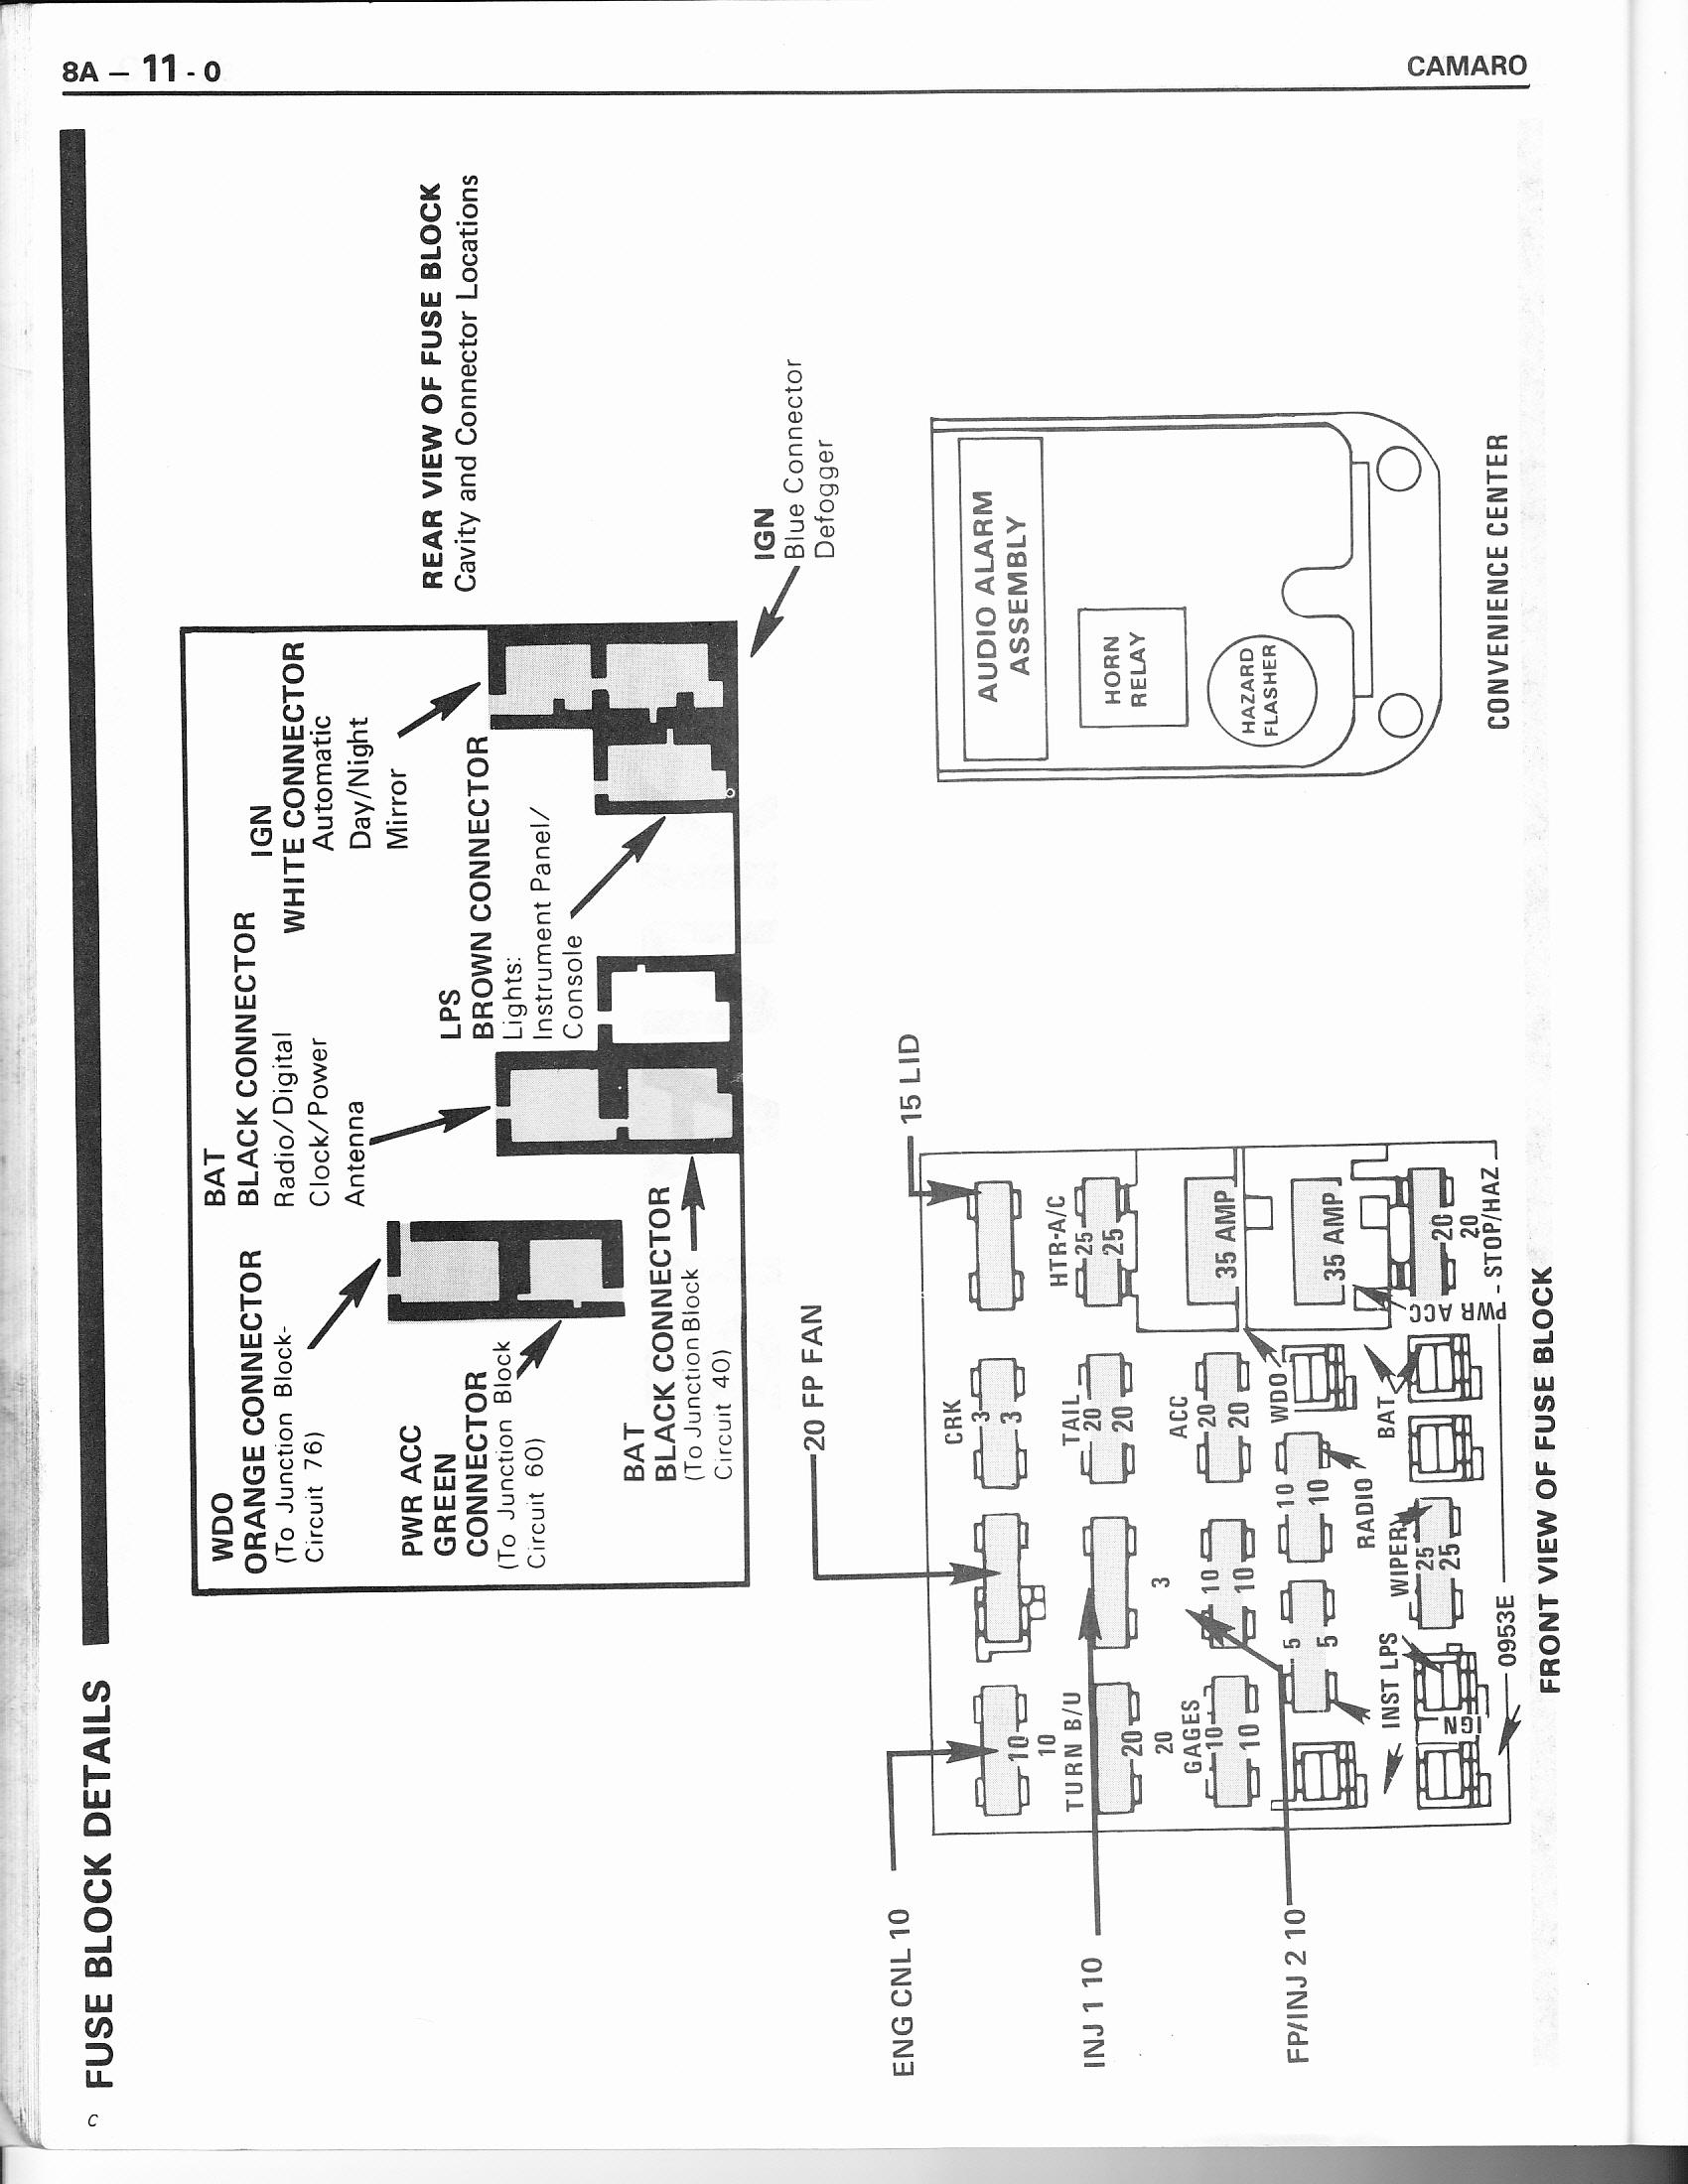 700r4 Transmission Wiring Diagram Further 700r4 Lockup Wiring Diagram